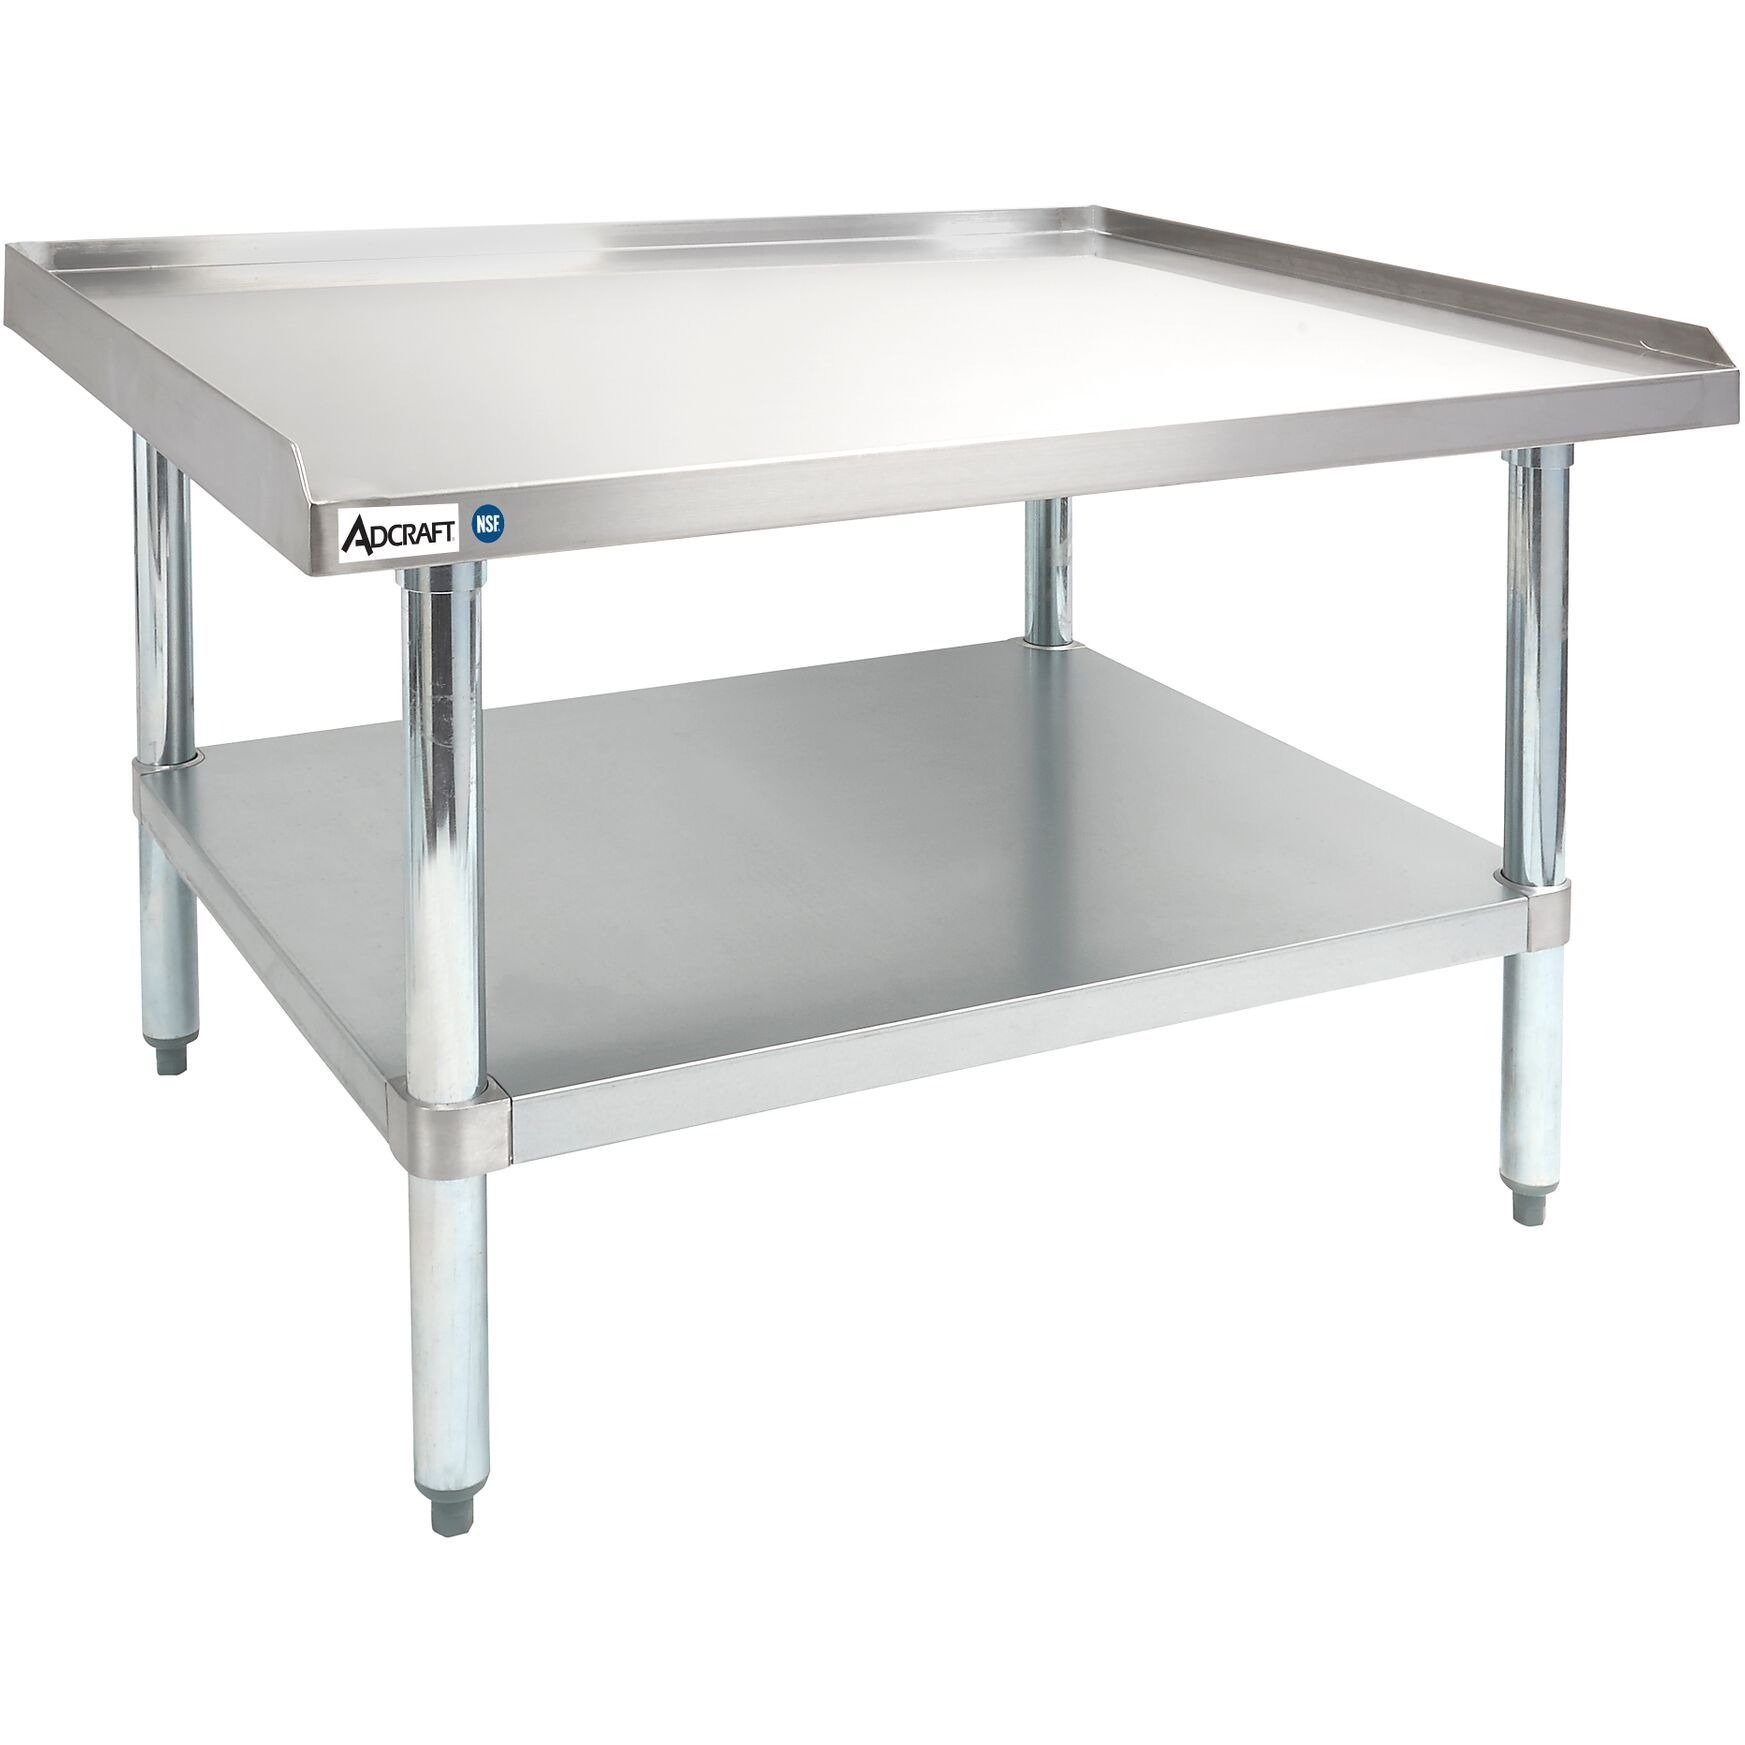 Sportsman Series Upturned Edge Stainless Steel Work Table 24 x 48 w Splash Guard